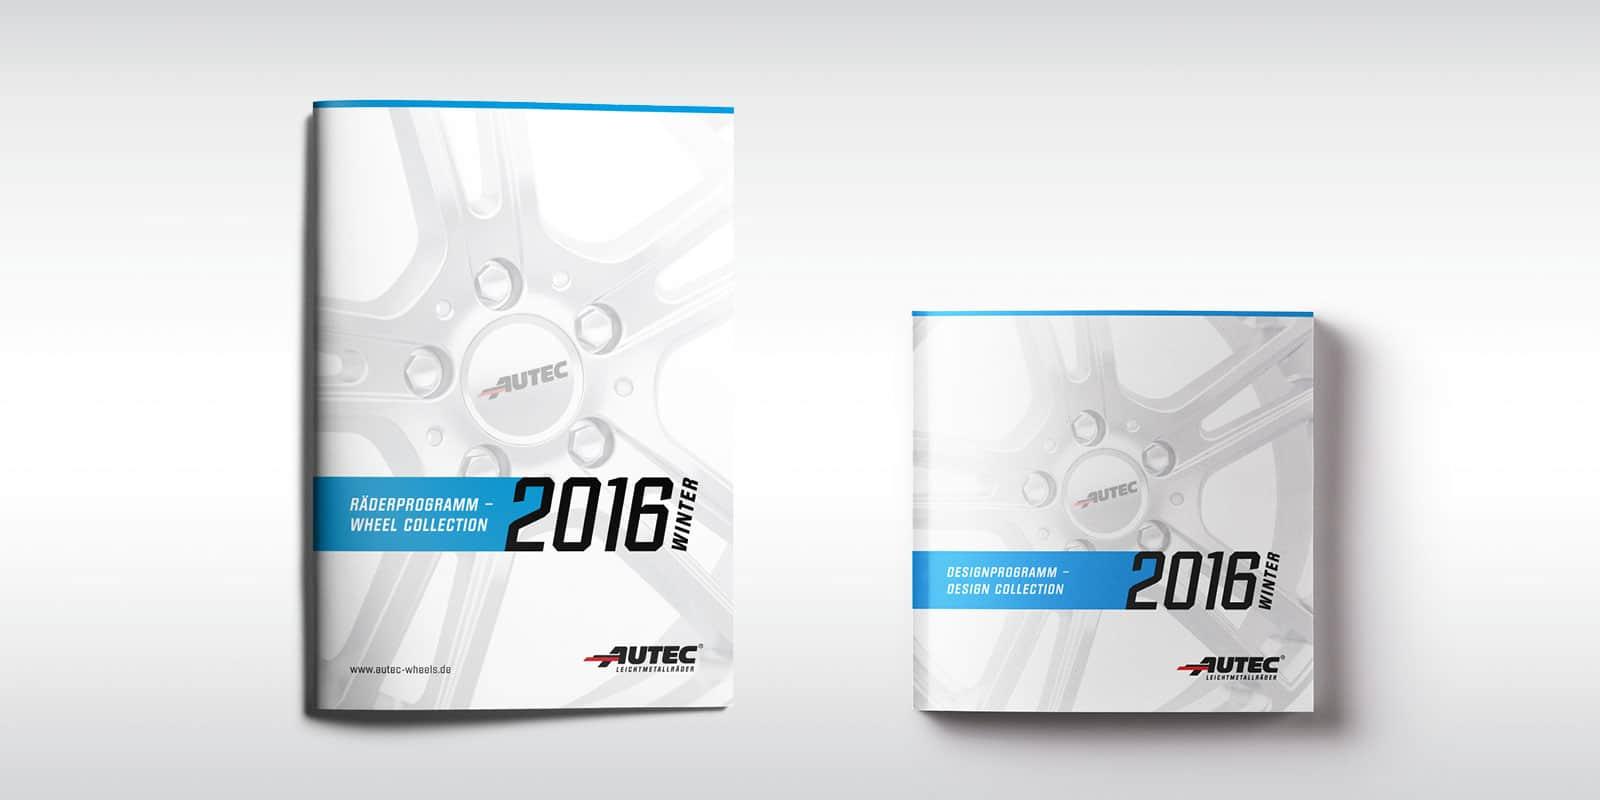 Autec – Räderprogramm & Designprogramm Winter